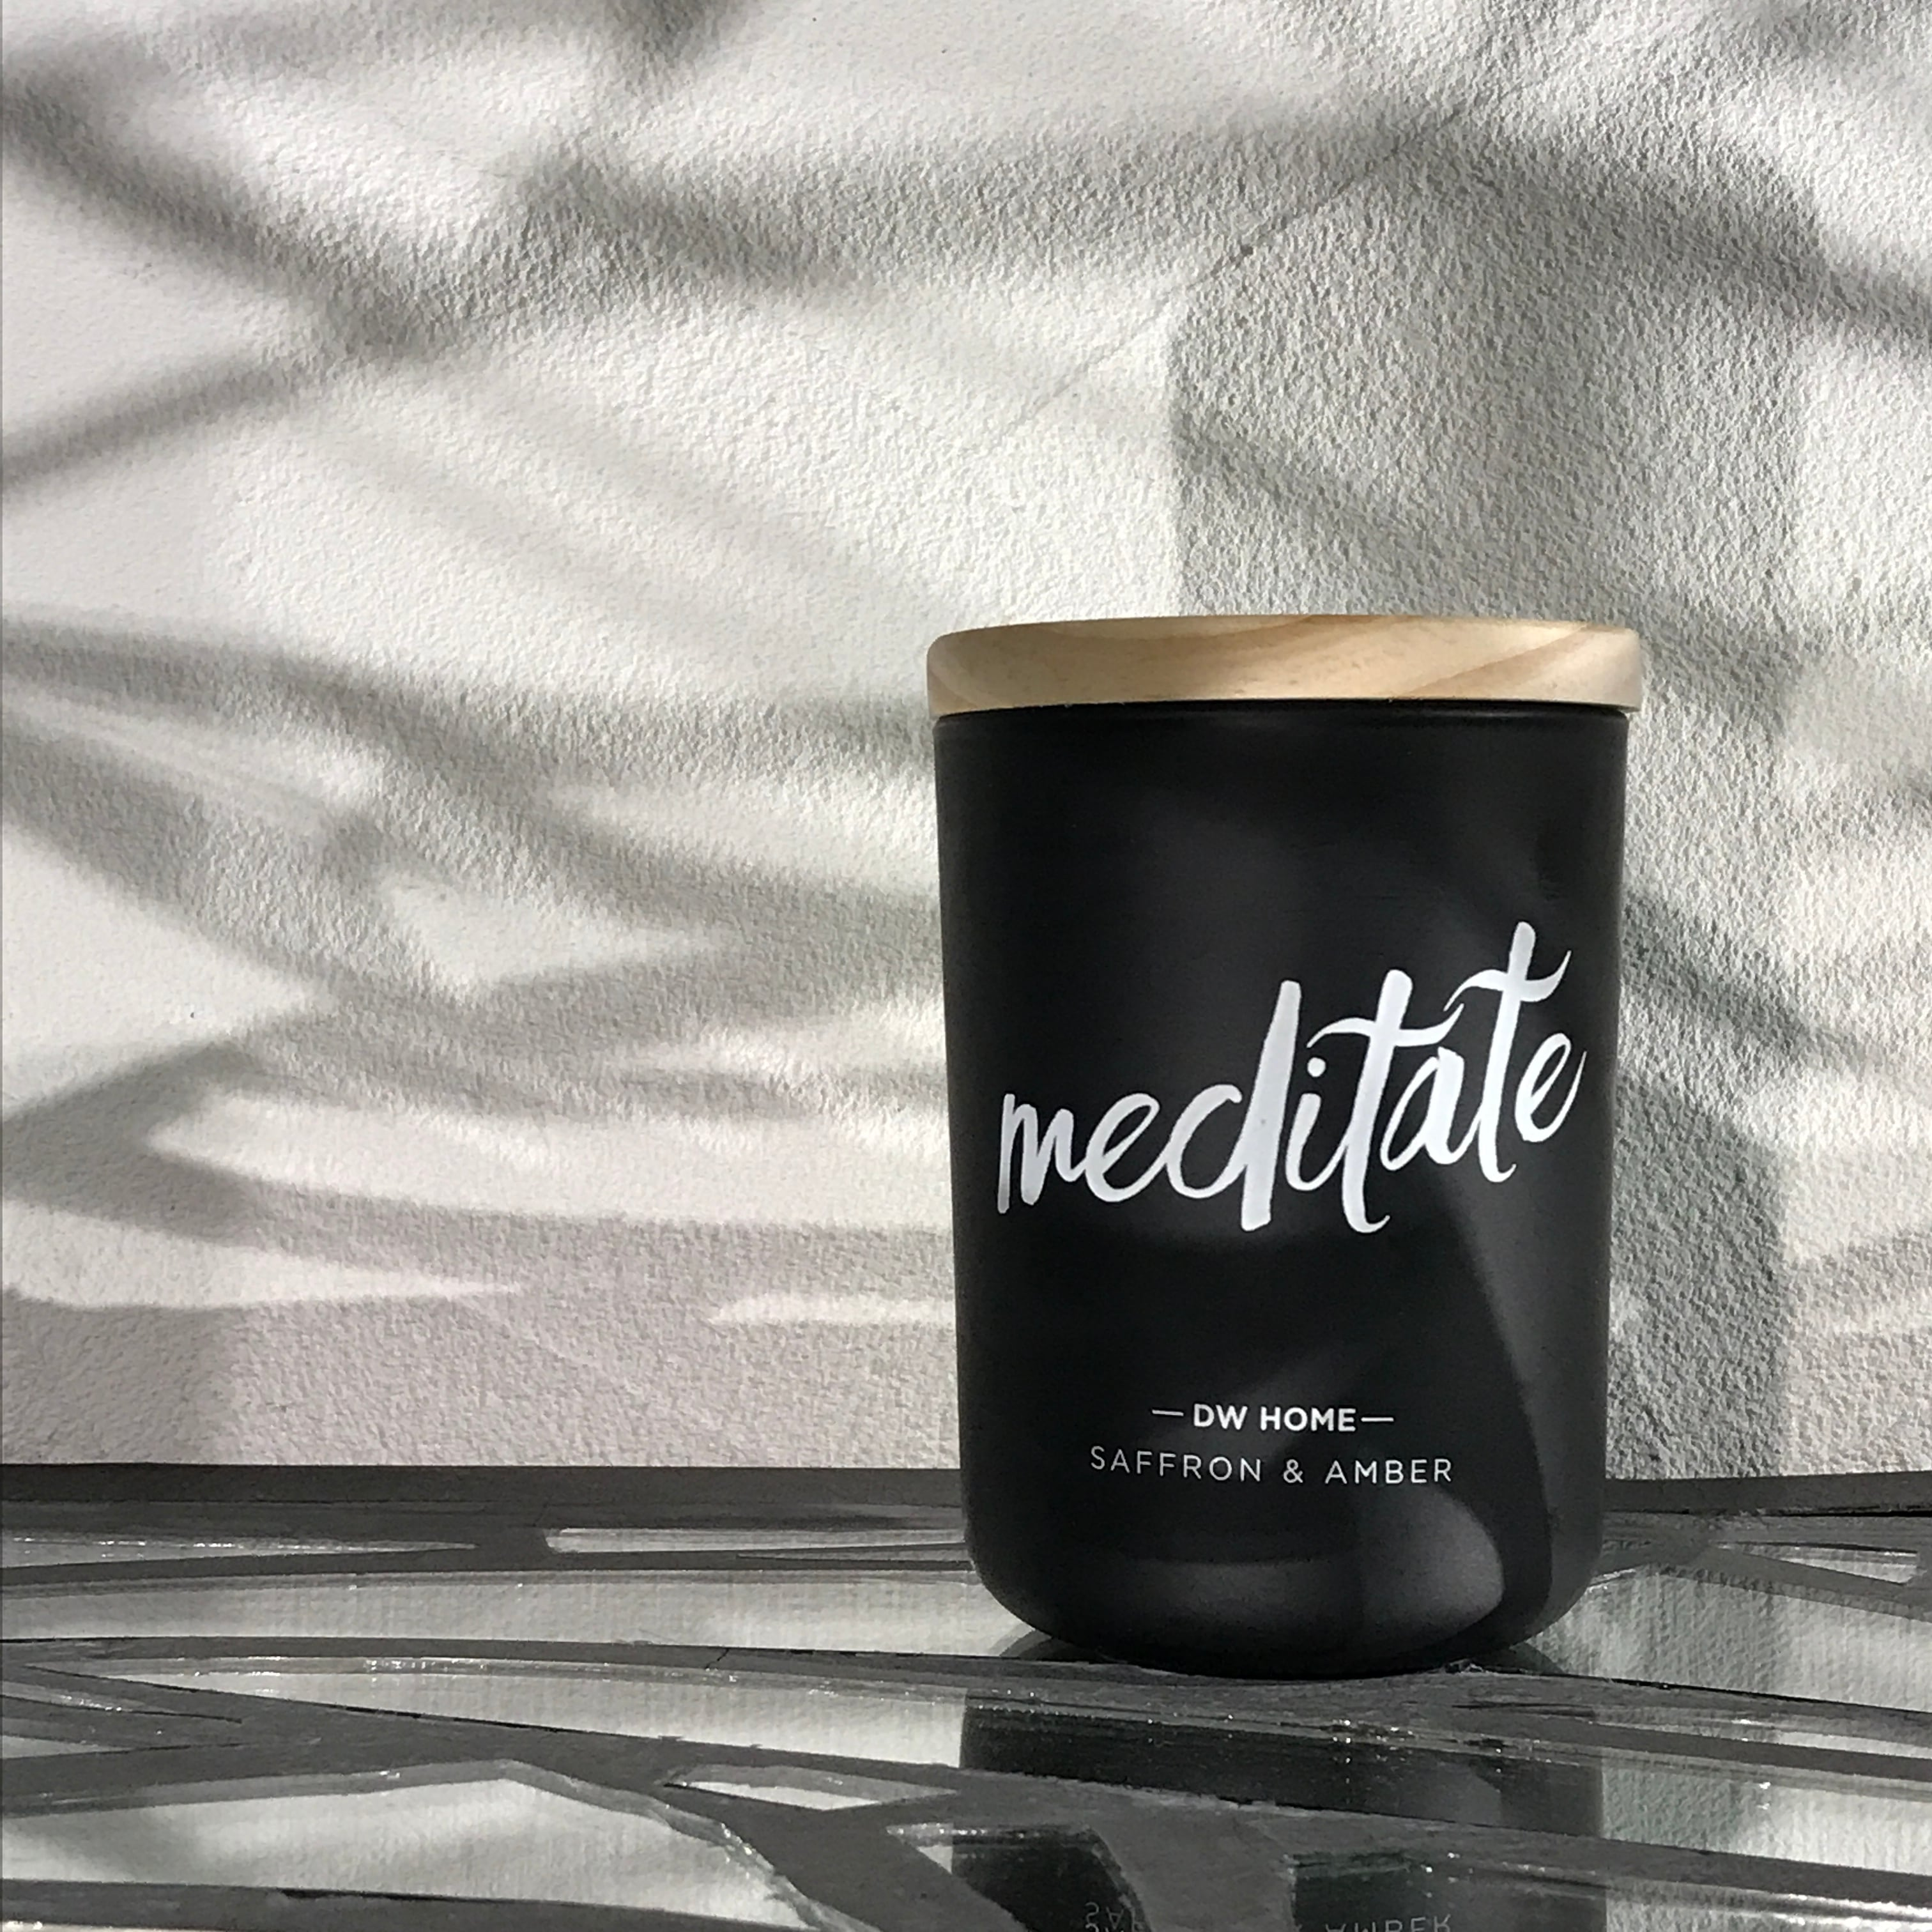 【DW Home Candles】meditate (SAFFRON & AMBER)